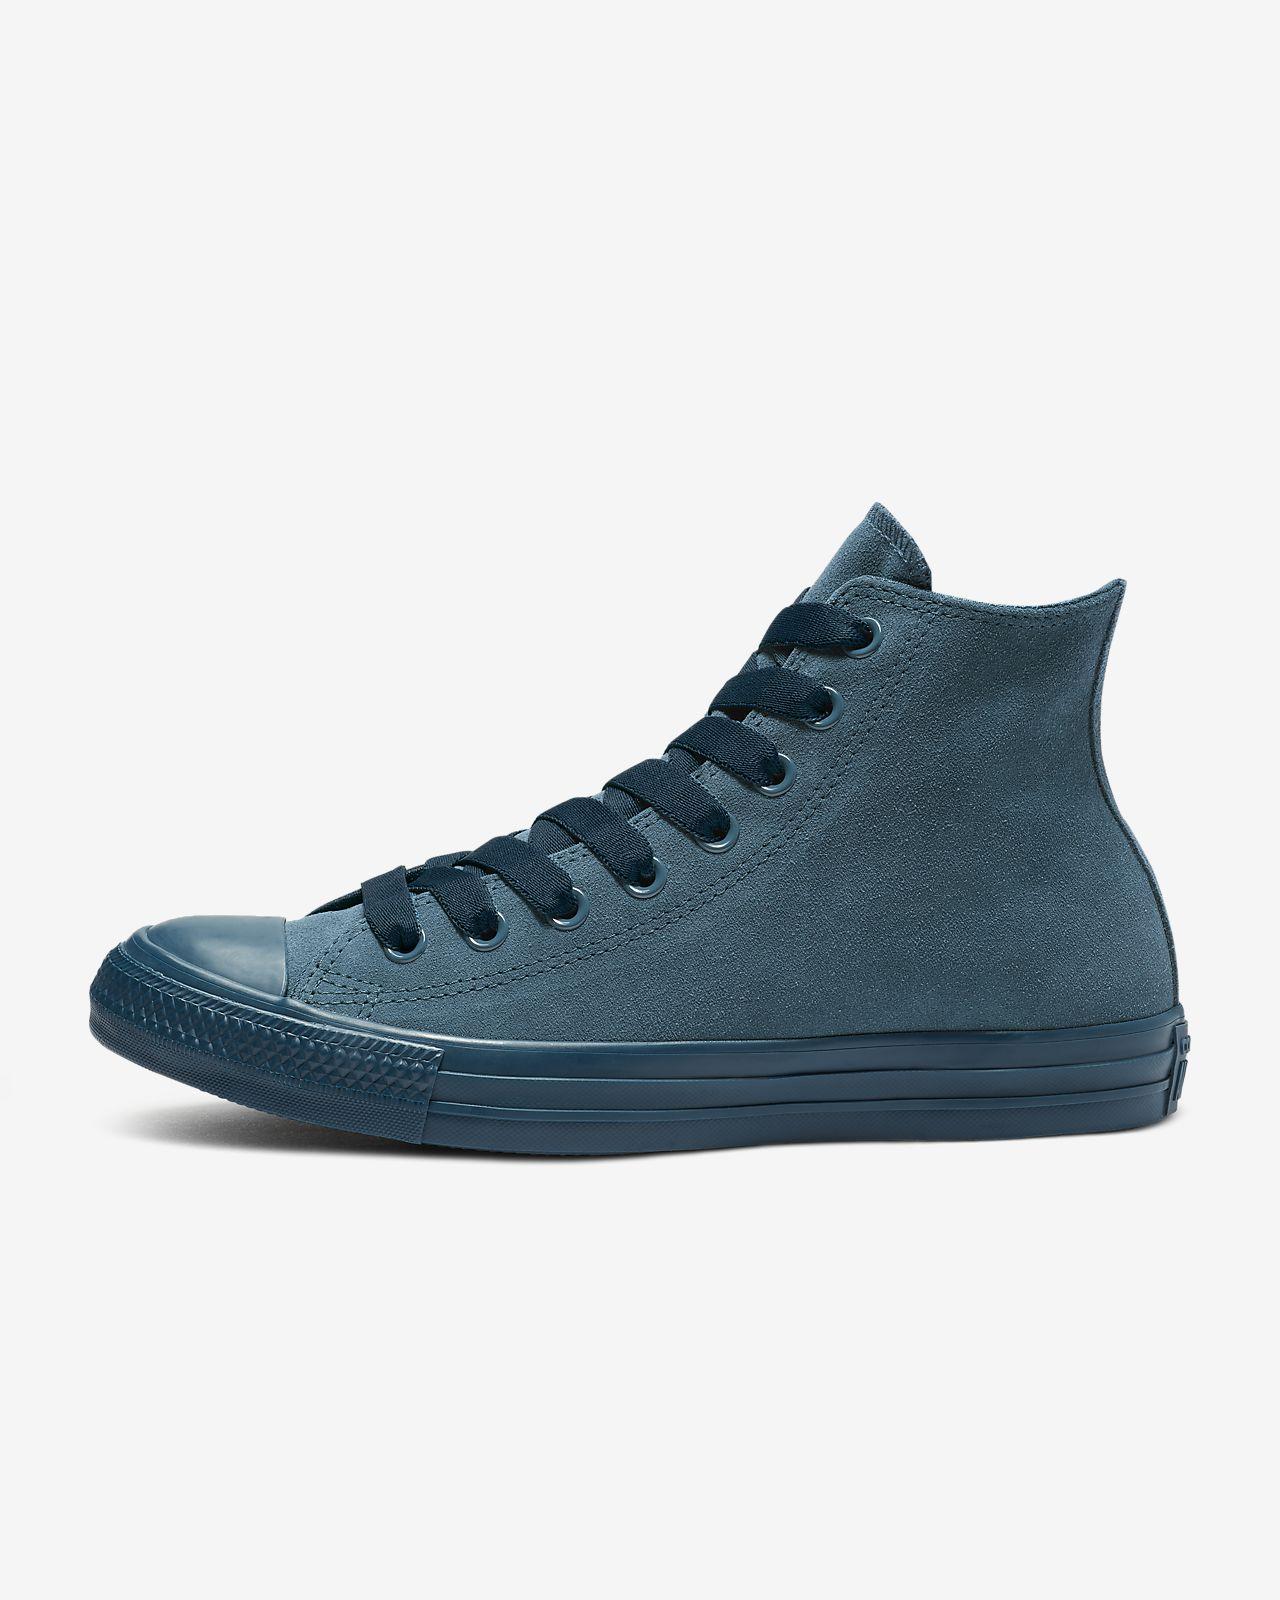 Converse Chuck Taylor All Star Suede Mono Color High Top  Unisex Shoe